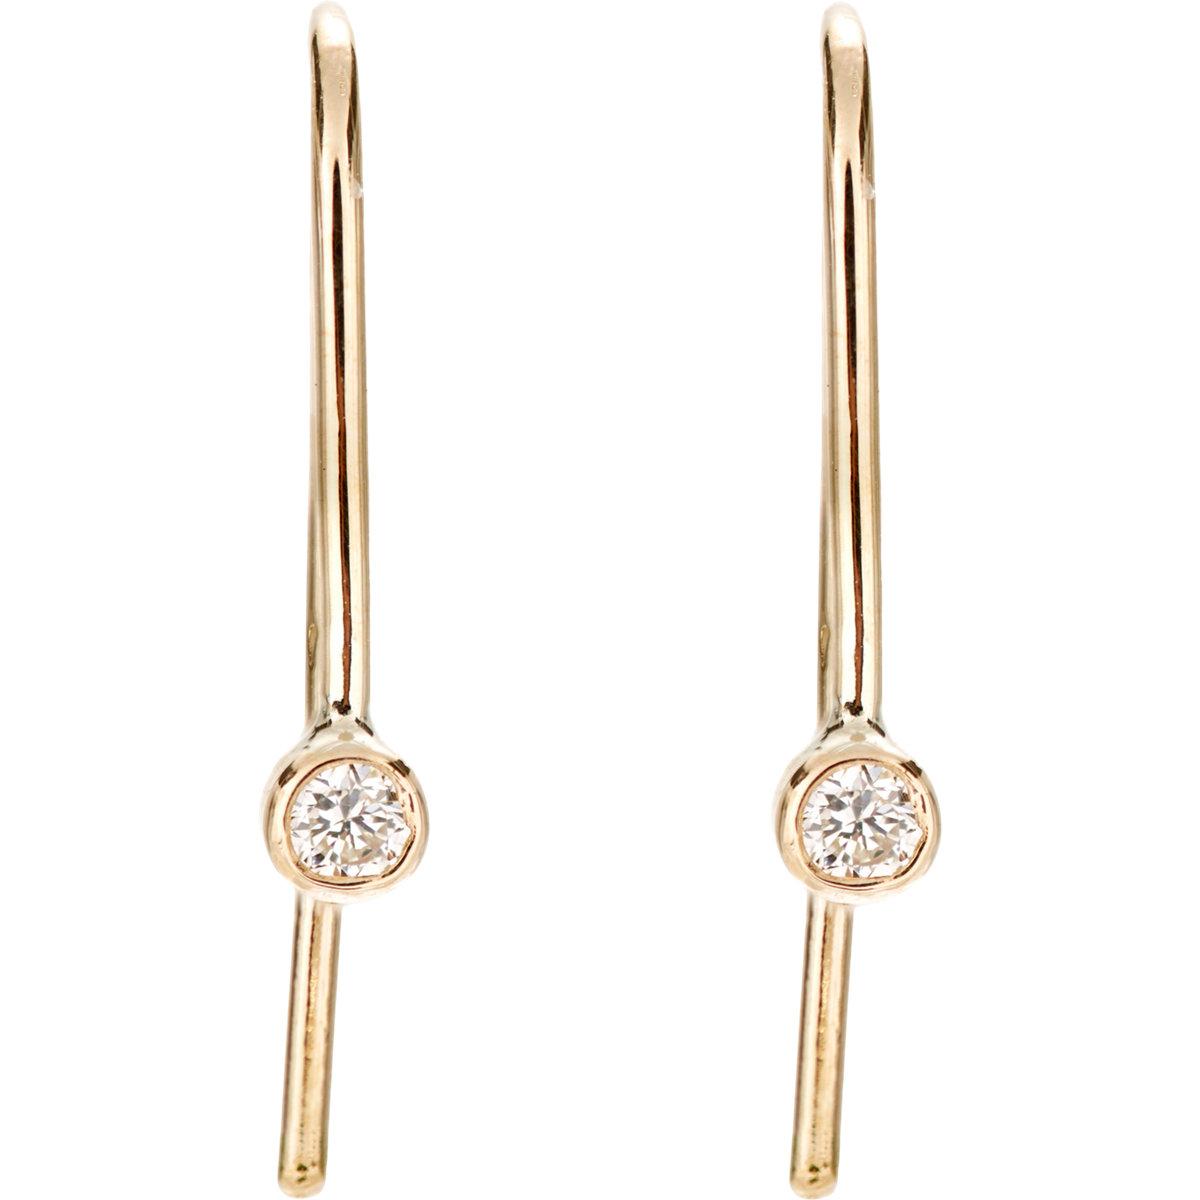 Grace Lee Designs 14-karat Gold Pearl Earrings - White 3C1A9NW